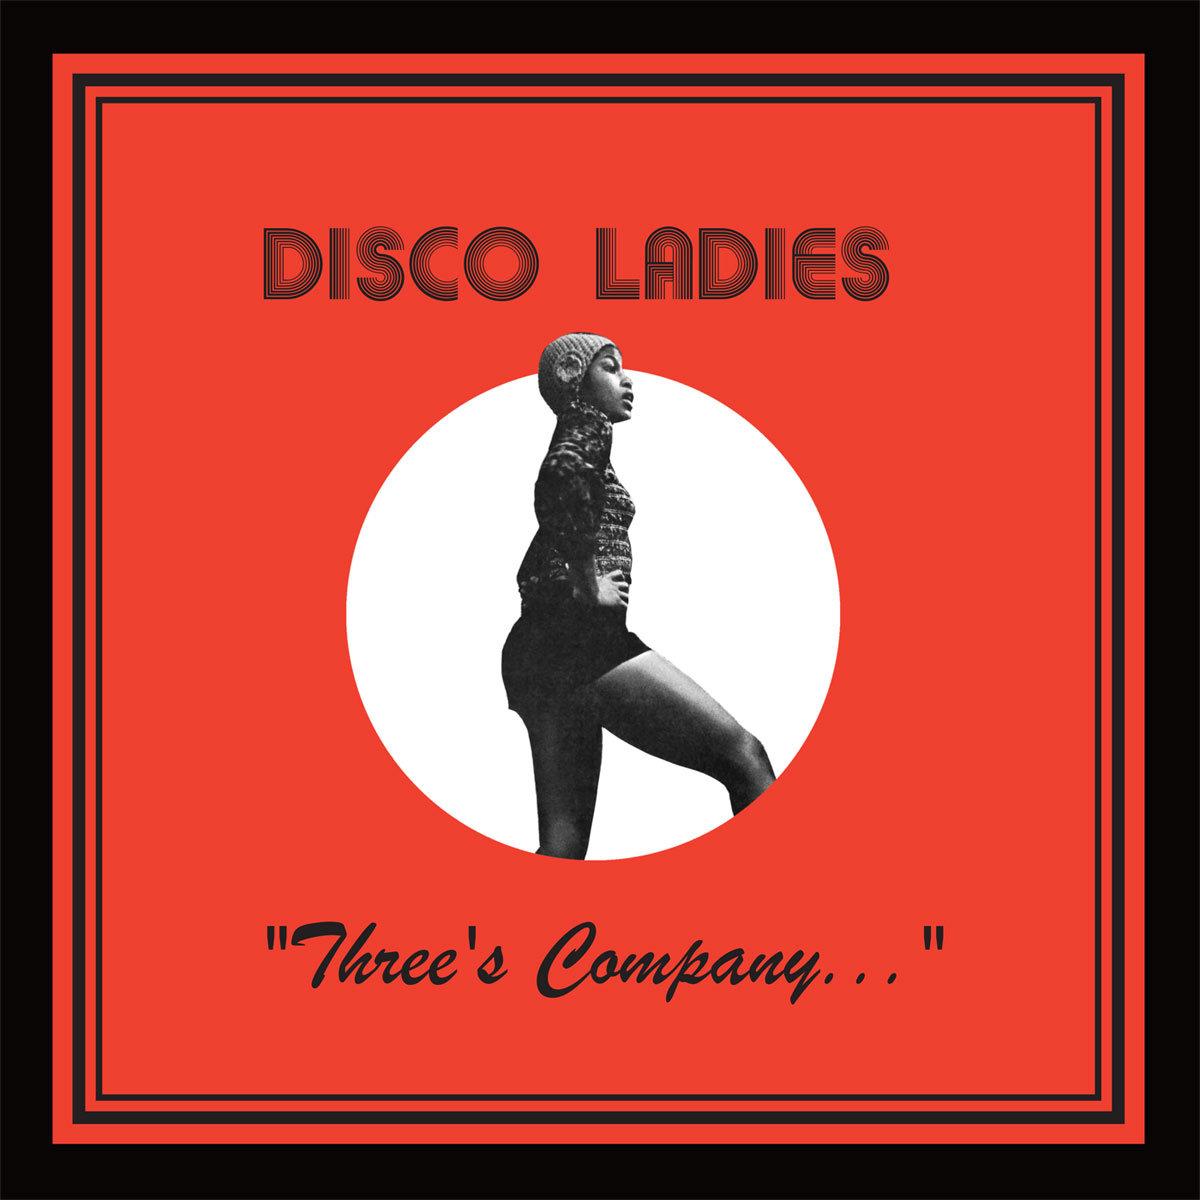 DISCO LADIES -